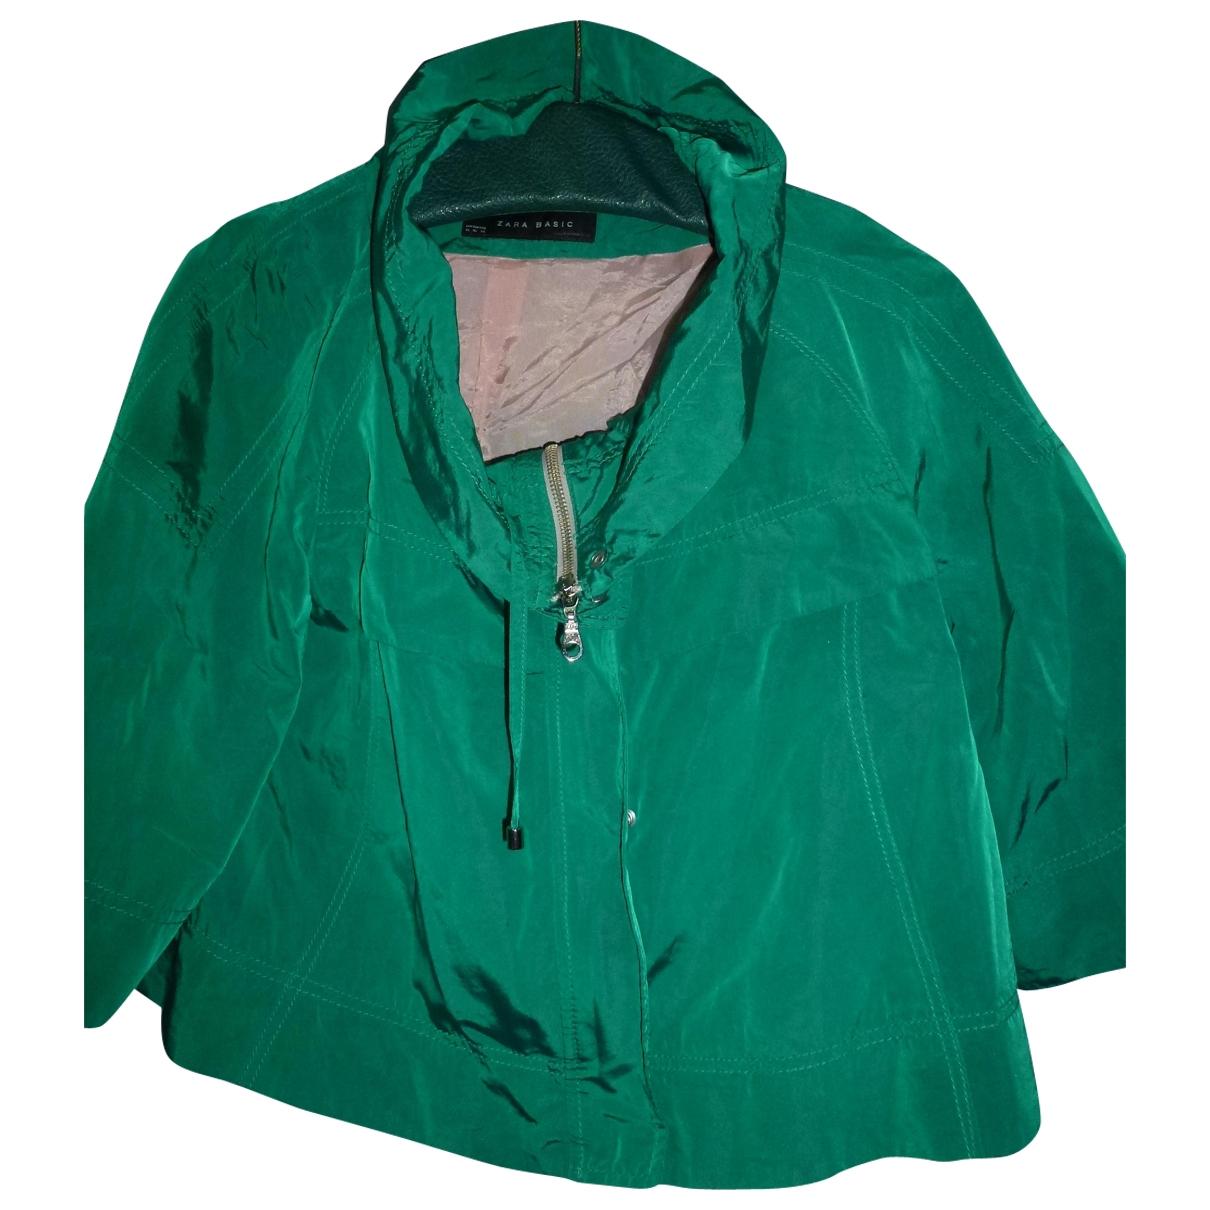 Zara \N Green Leather jacket for Women XL International